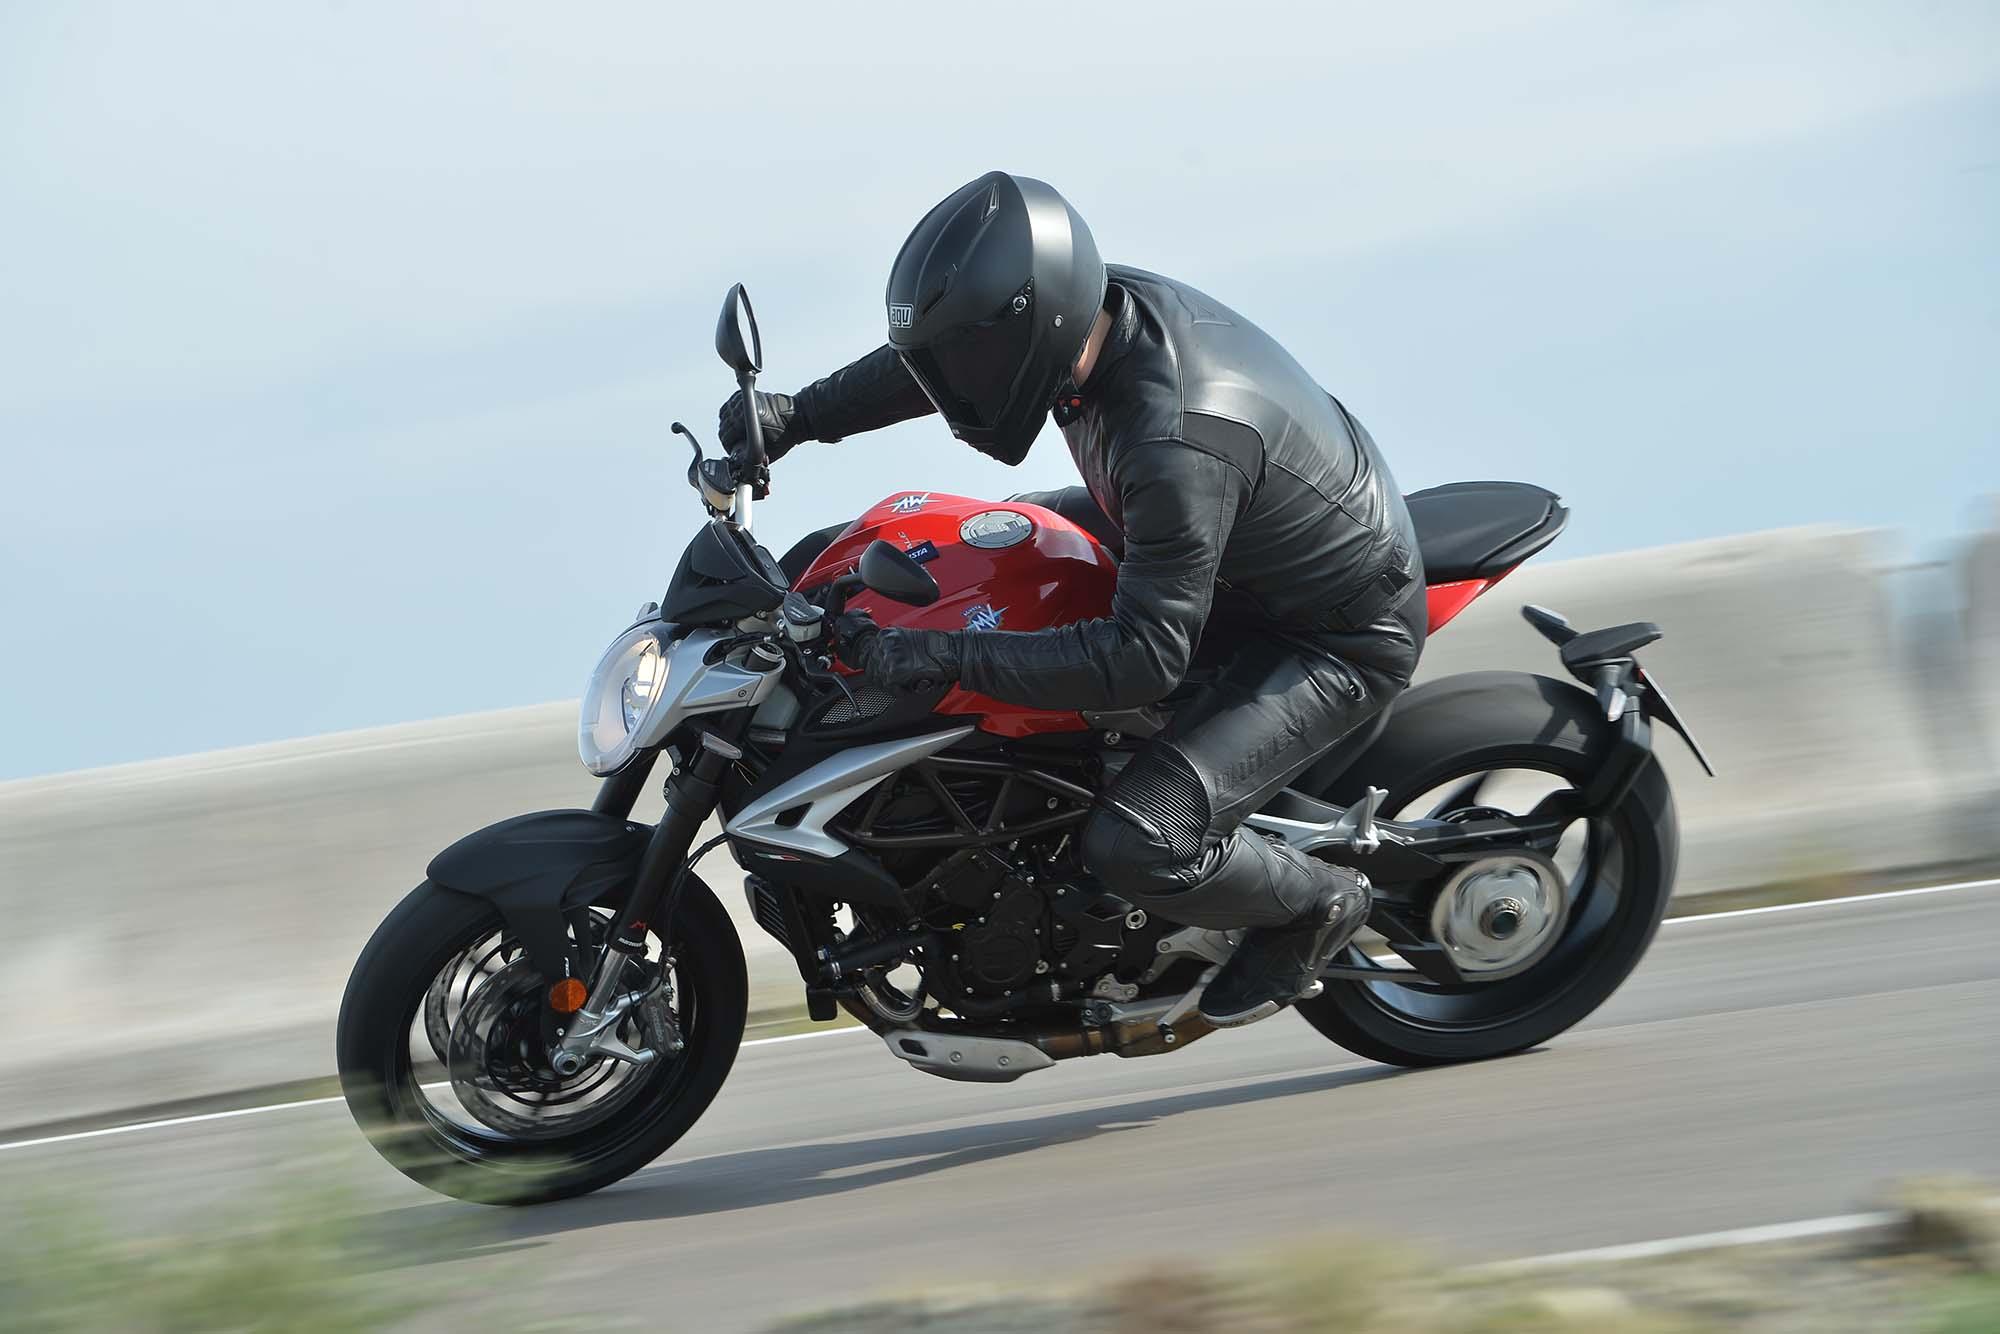 is the mv agusta brutale 800 the best bike on the market? - asphalt